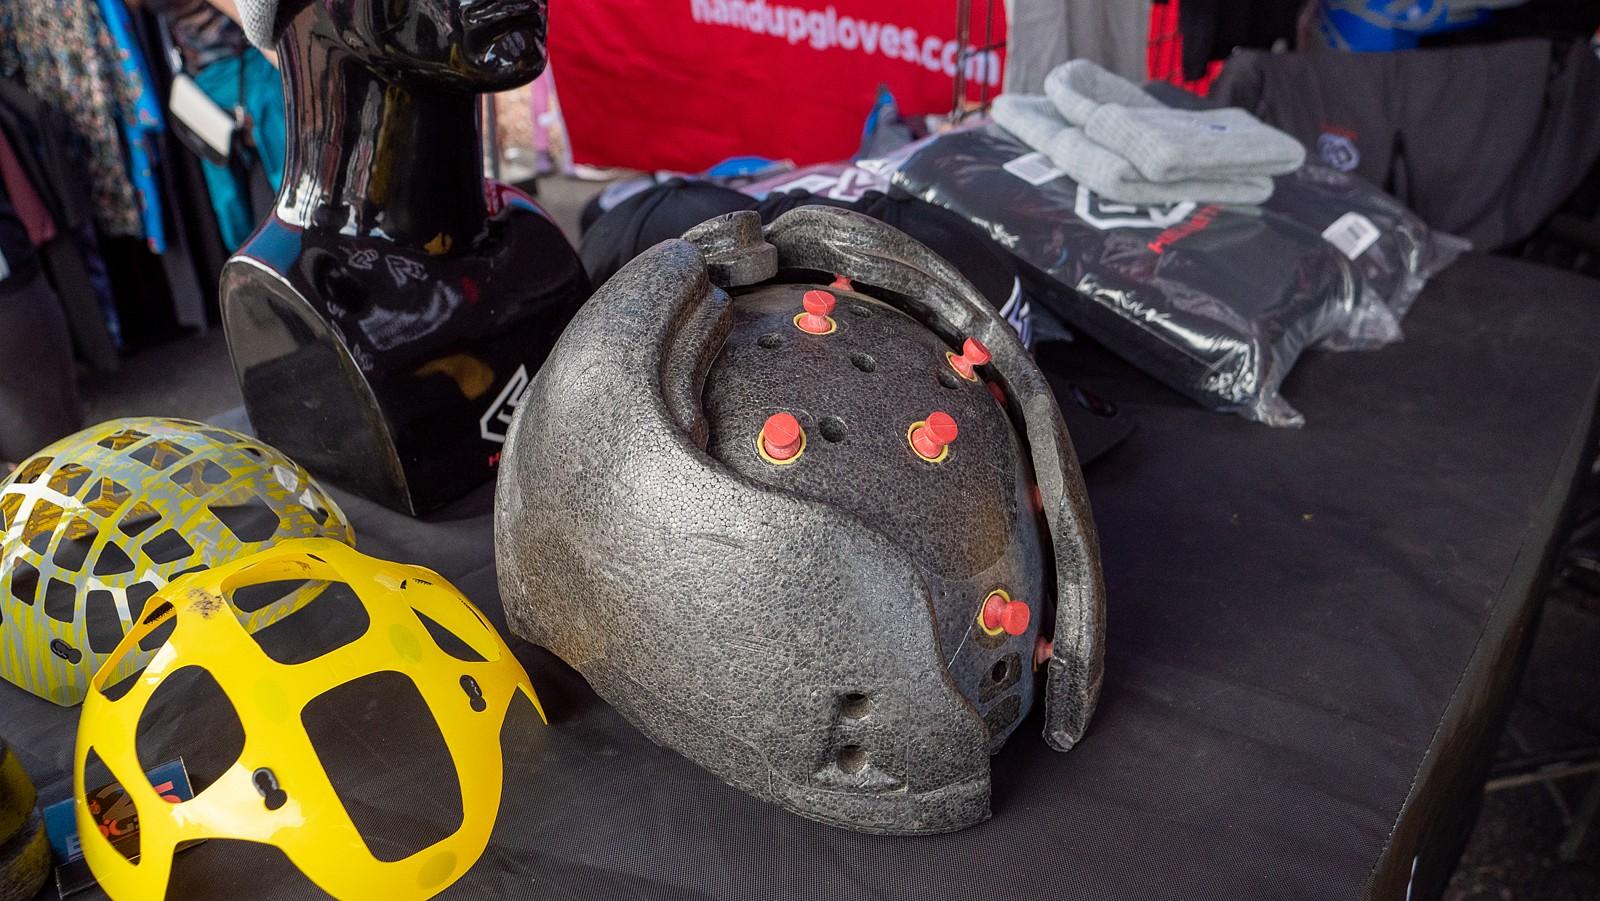 6D Helmet Technology - PIT BITS 2 - Sedona Bike Festival 2020 - Mountain Biking Pictures - Vital MTB